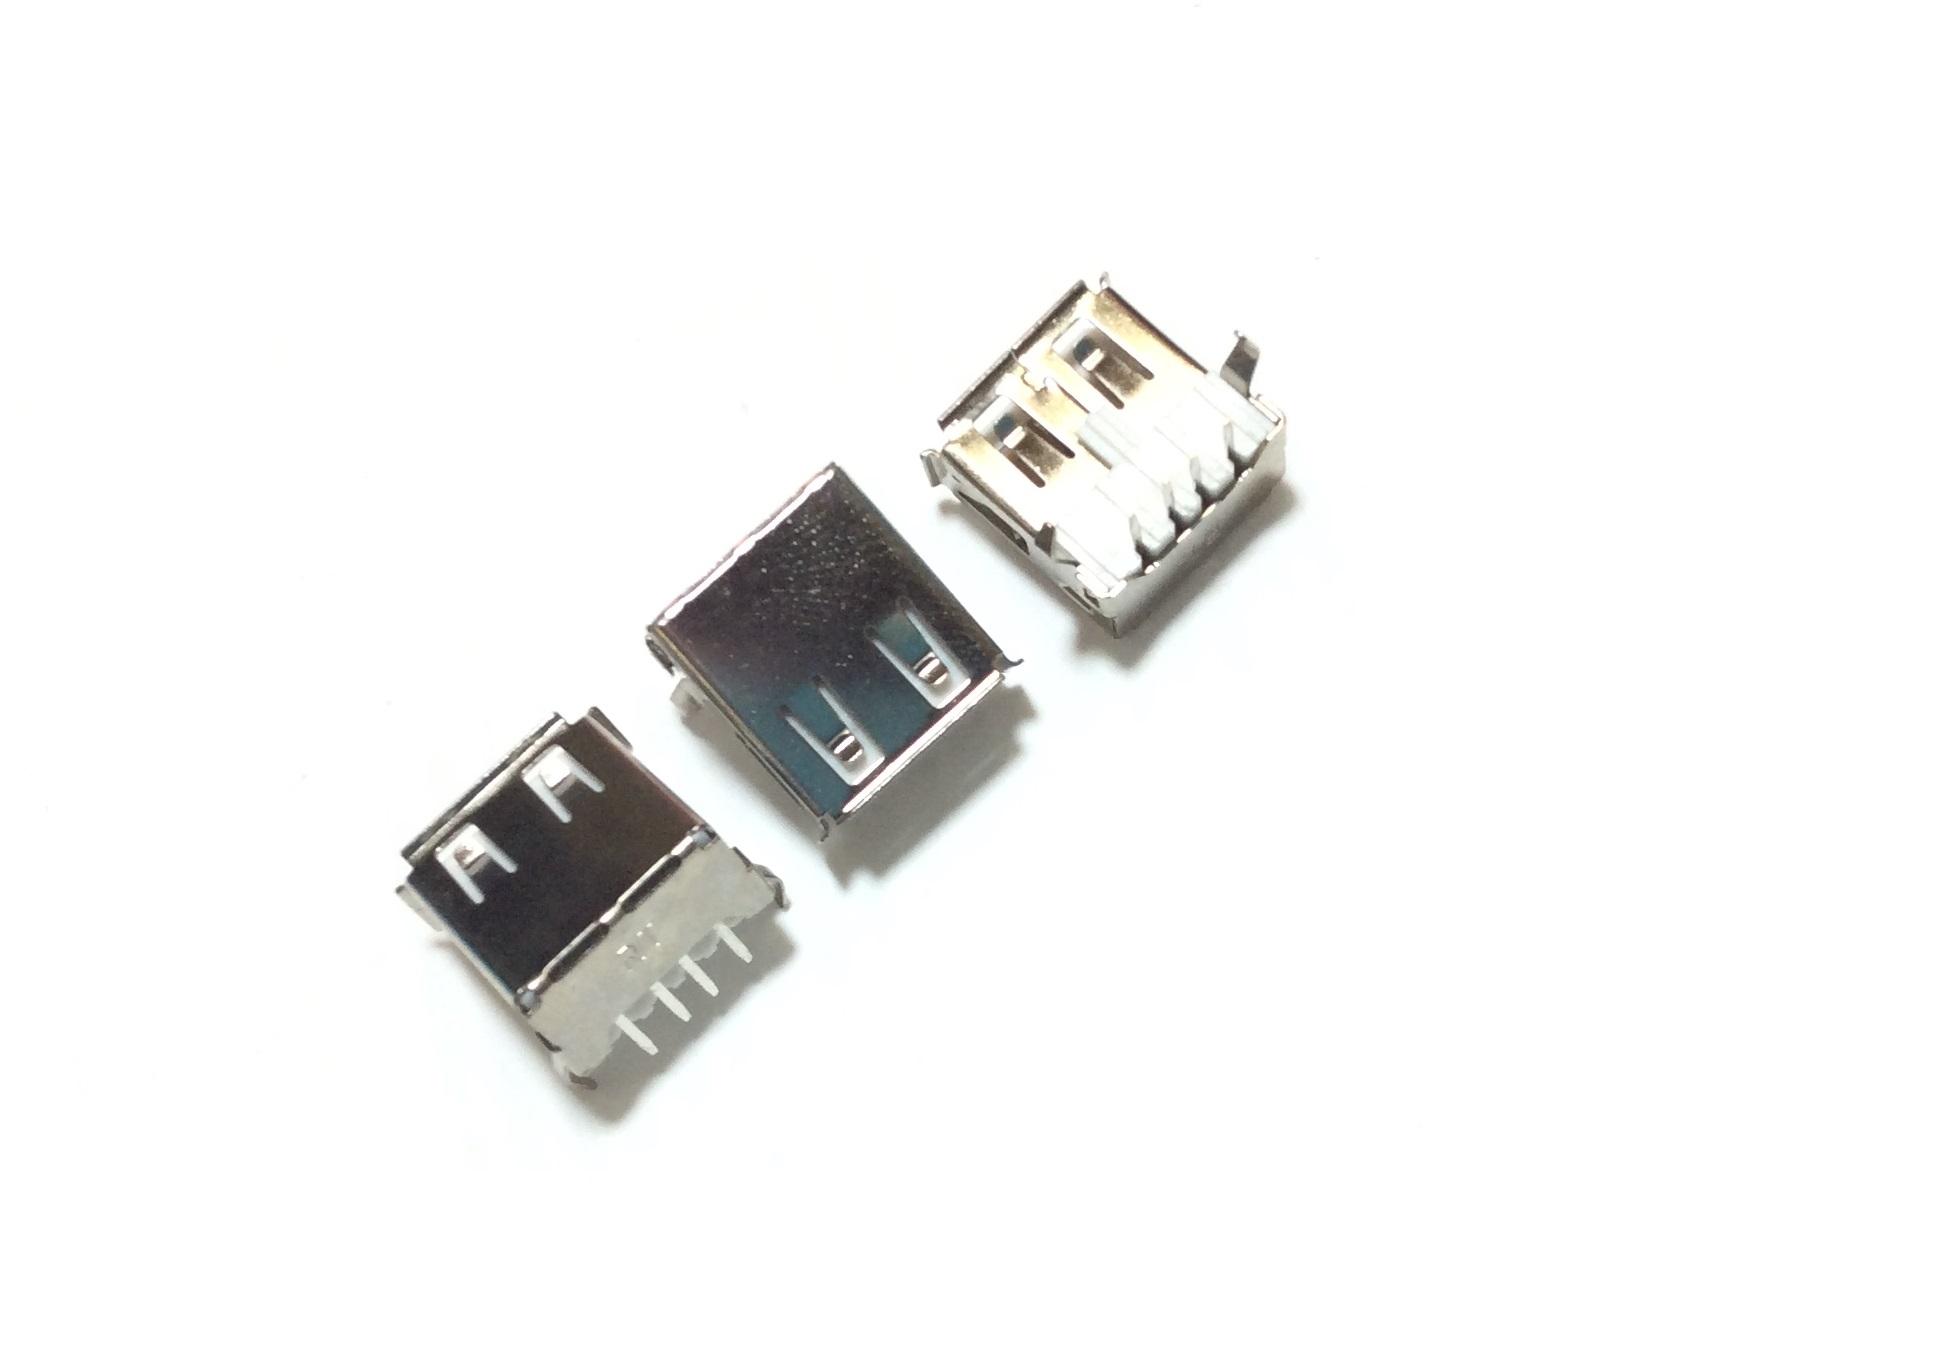 USB Socket Female Type-A 4 Pins